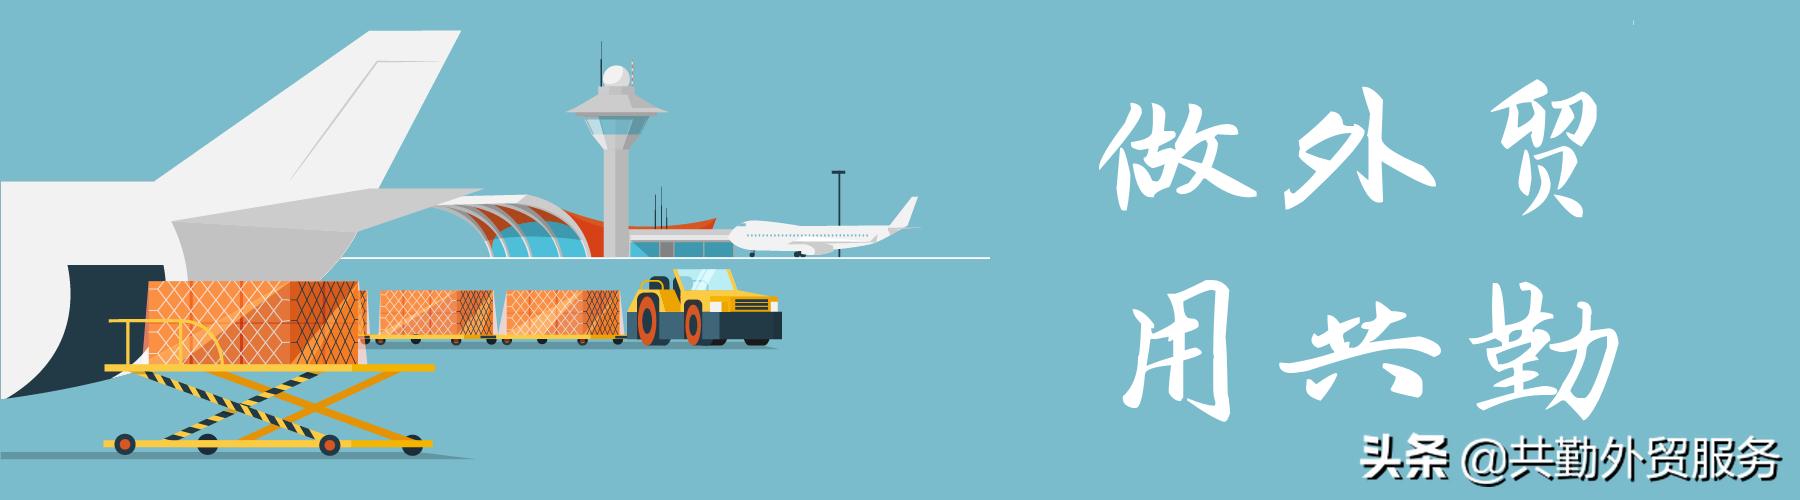 SkyCell筹集3500万美元投资以推动未来增长